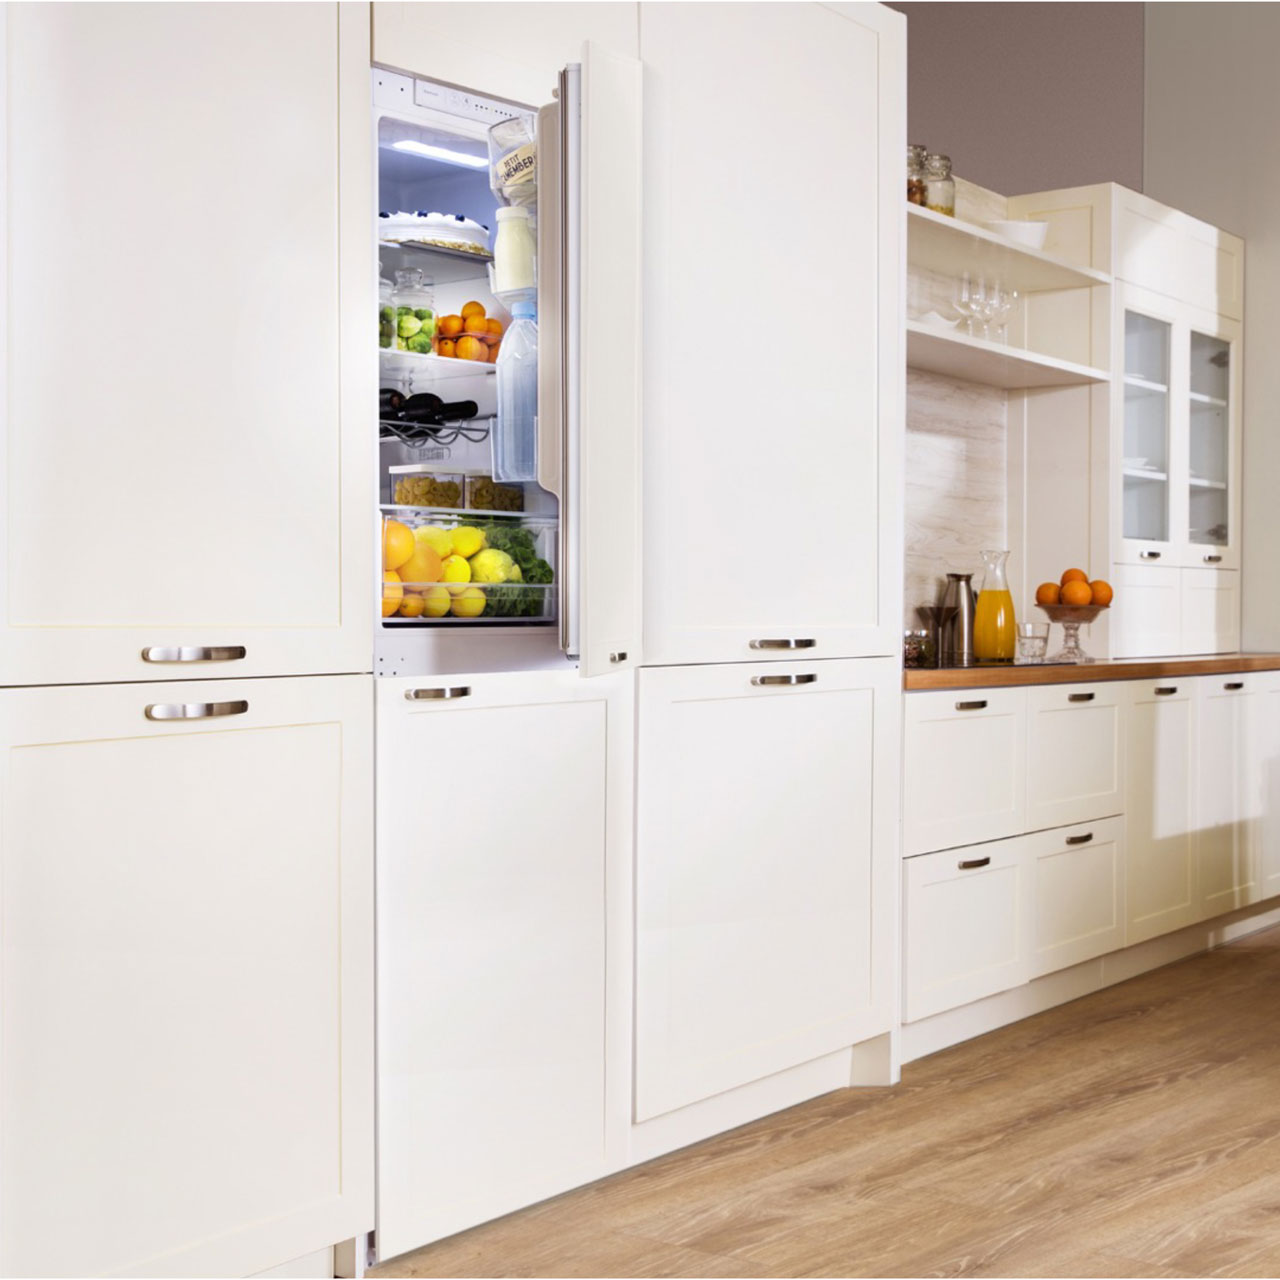 Kitchen Remodel Refrigerator: Washing Machines, Fridges & More